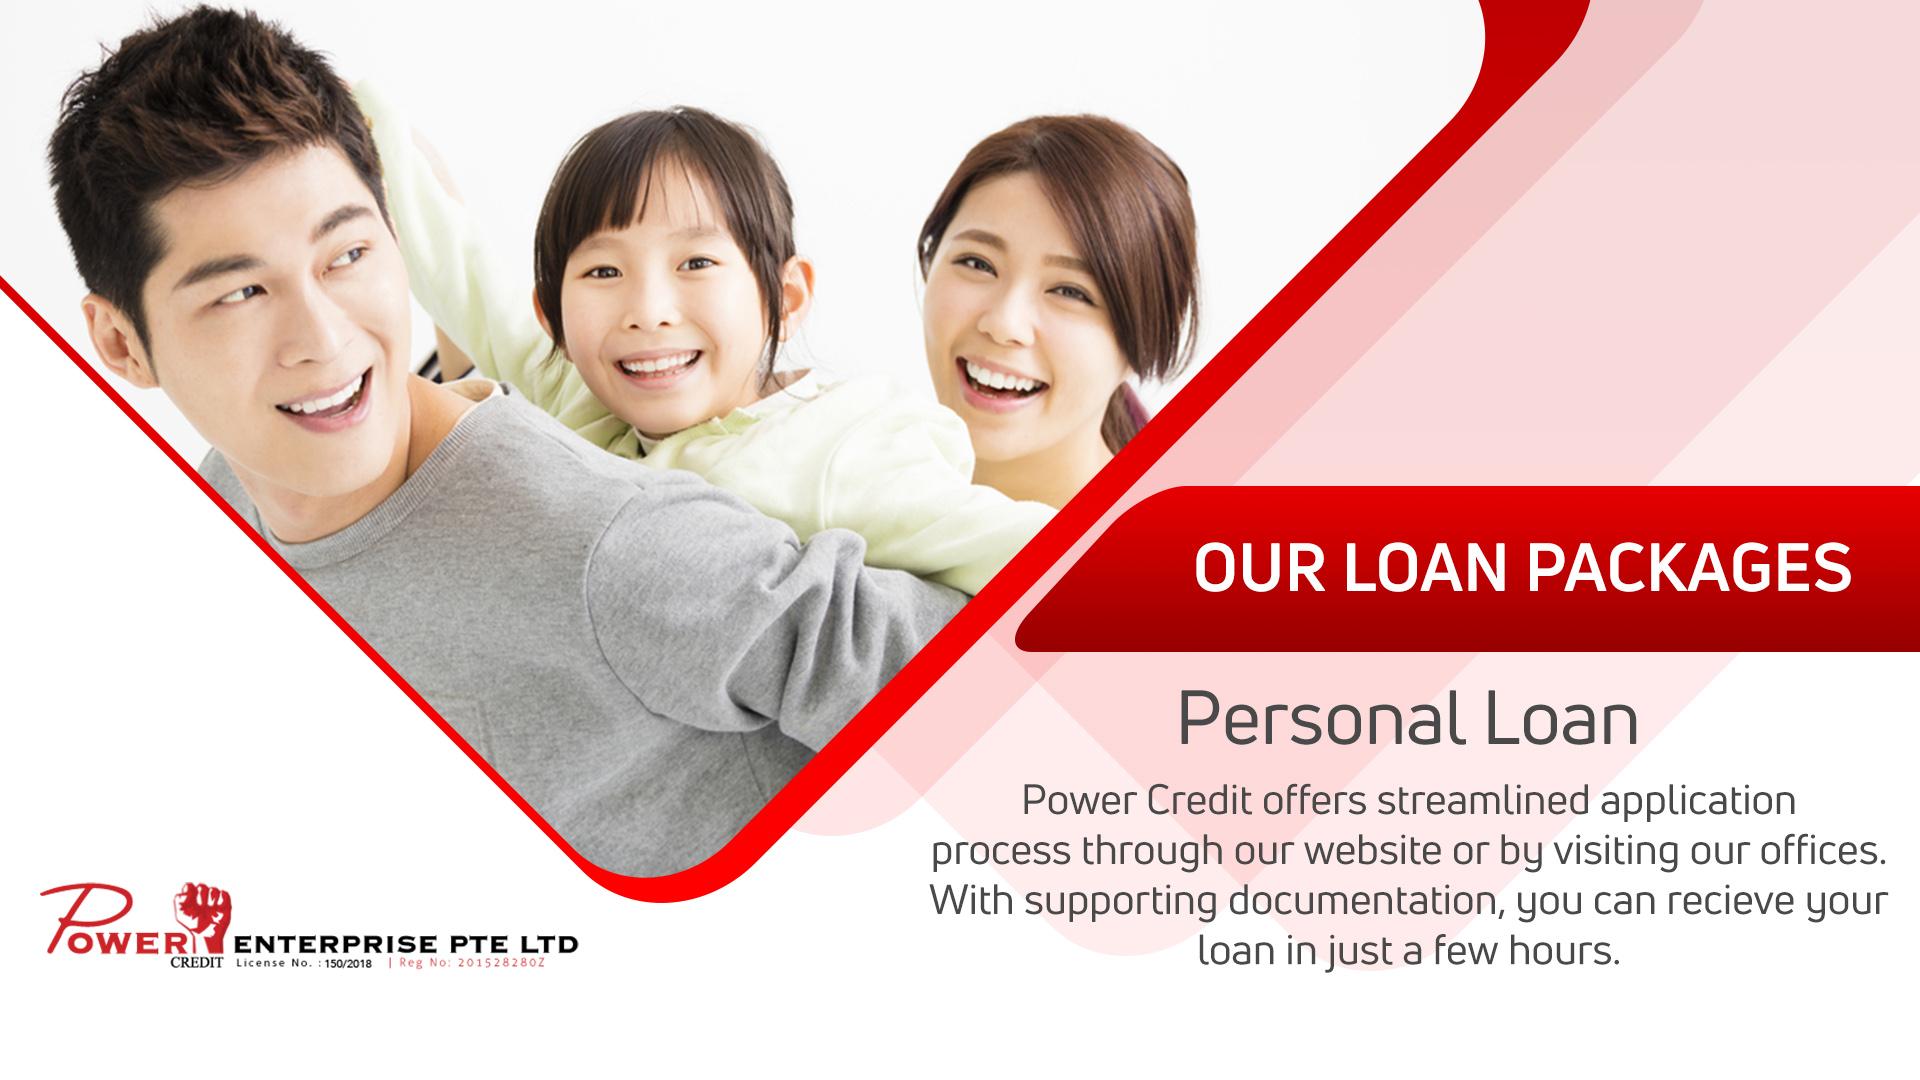 power credit